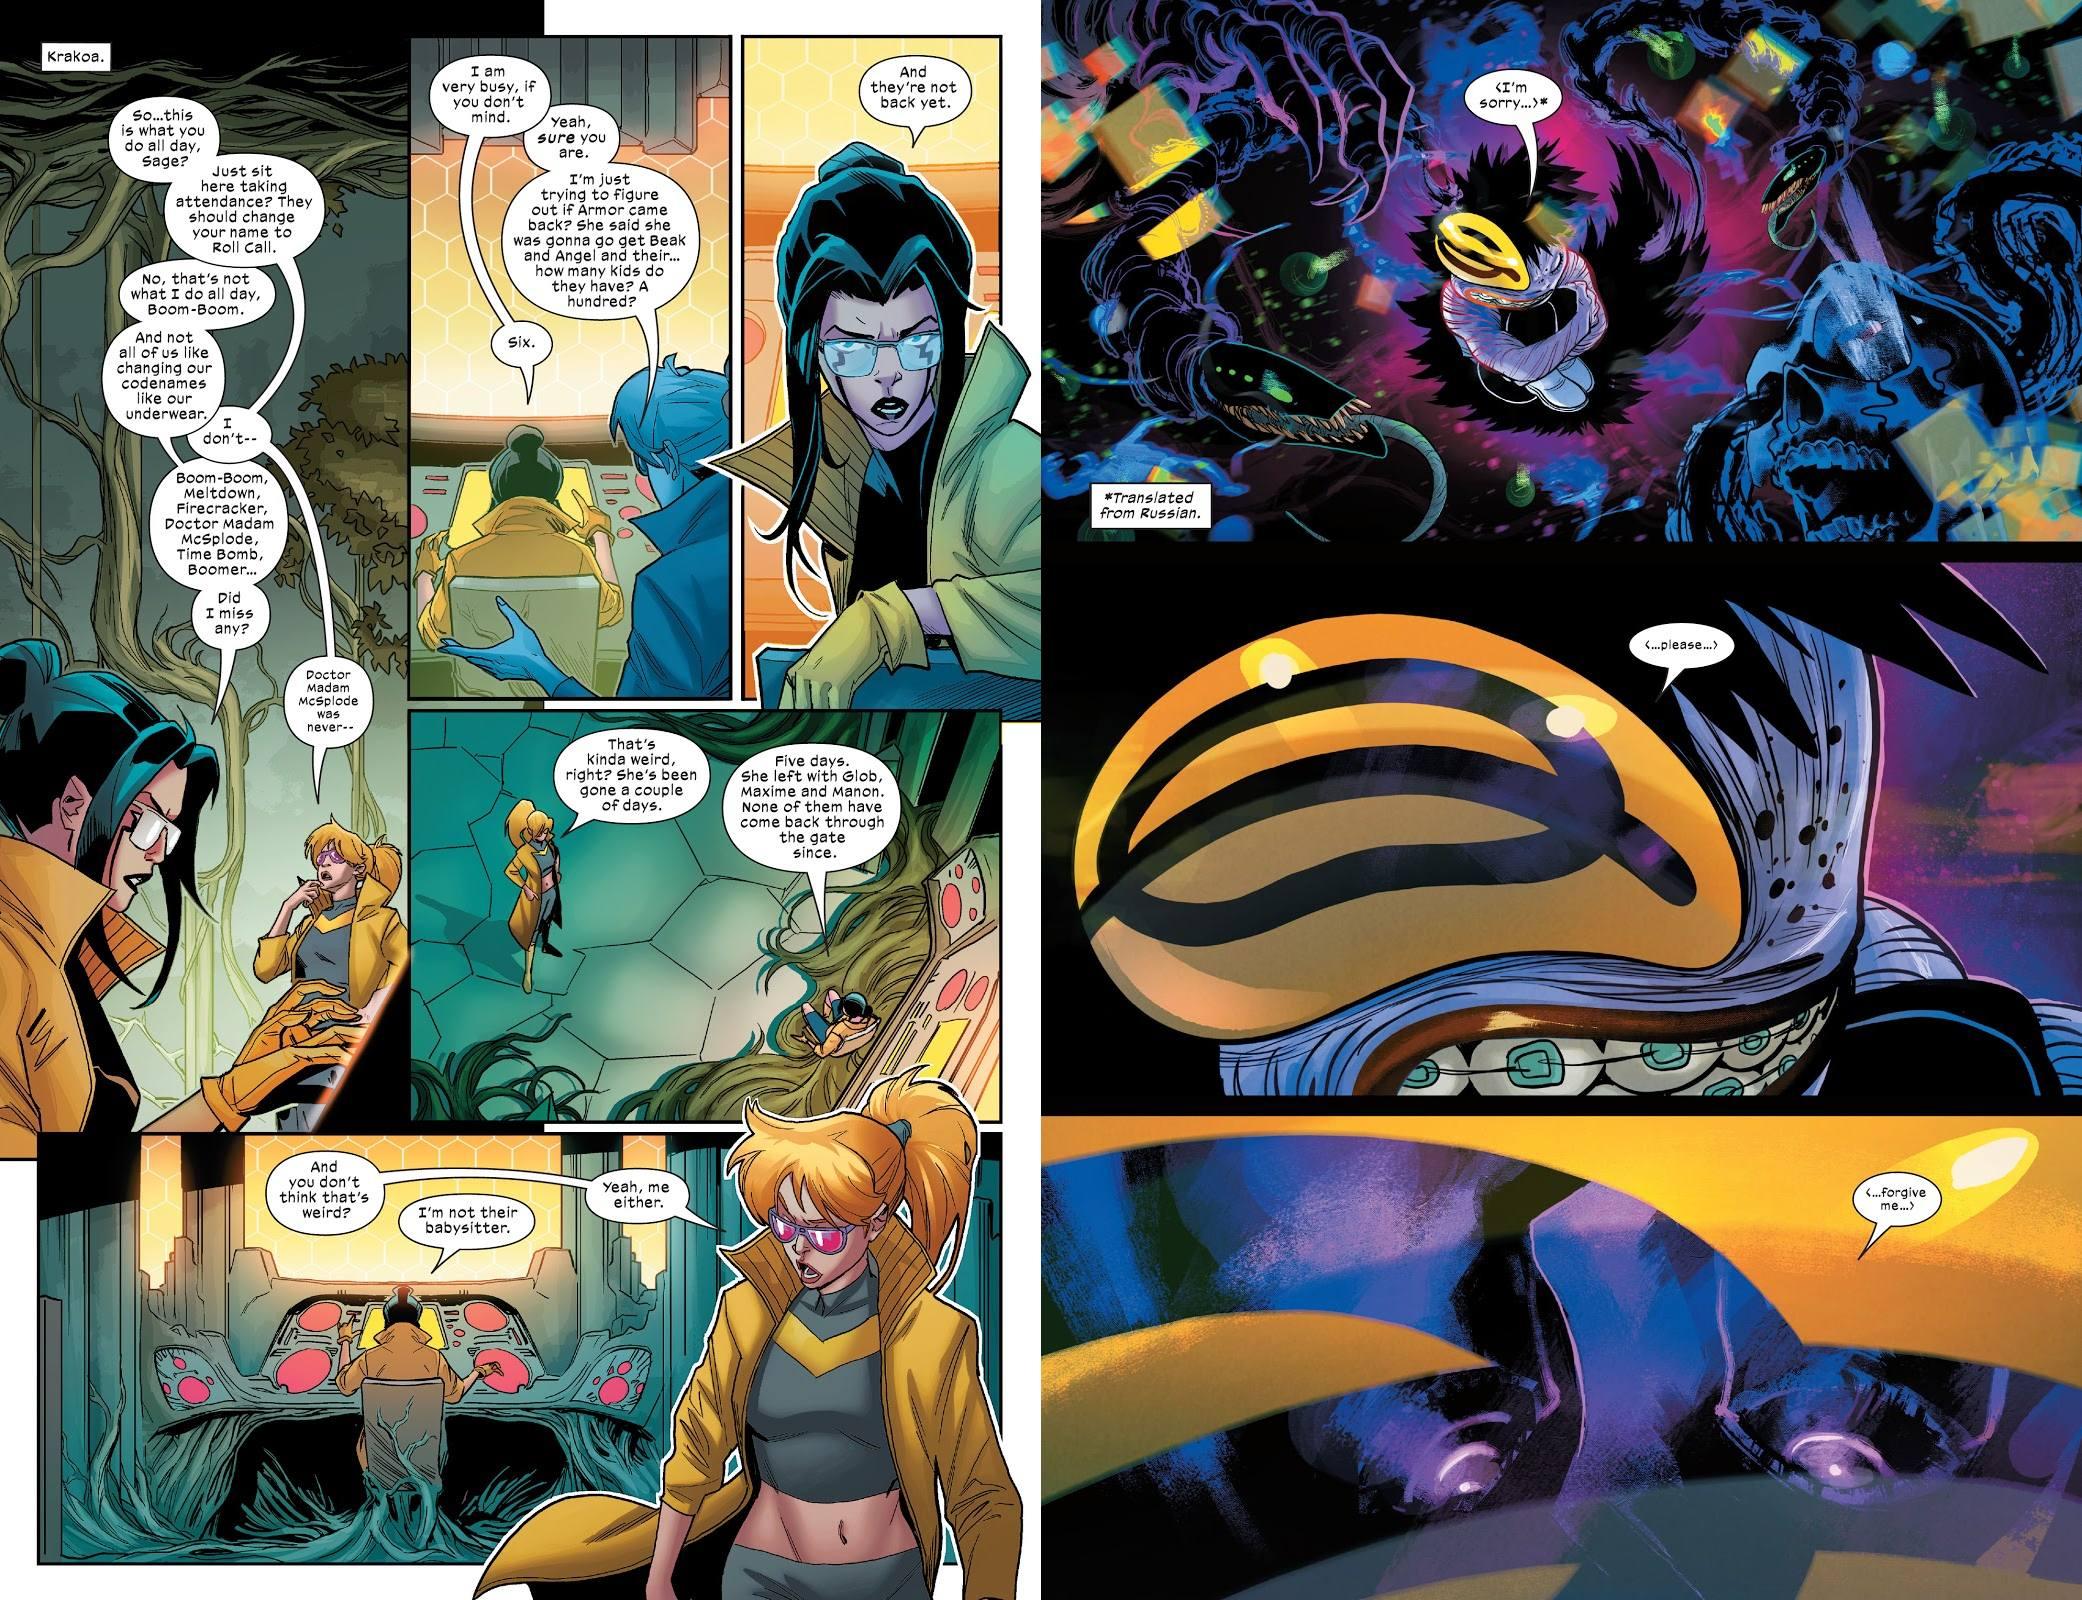 New Mutants by Ed Brisson Vol 1 review